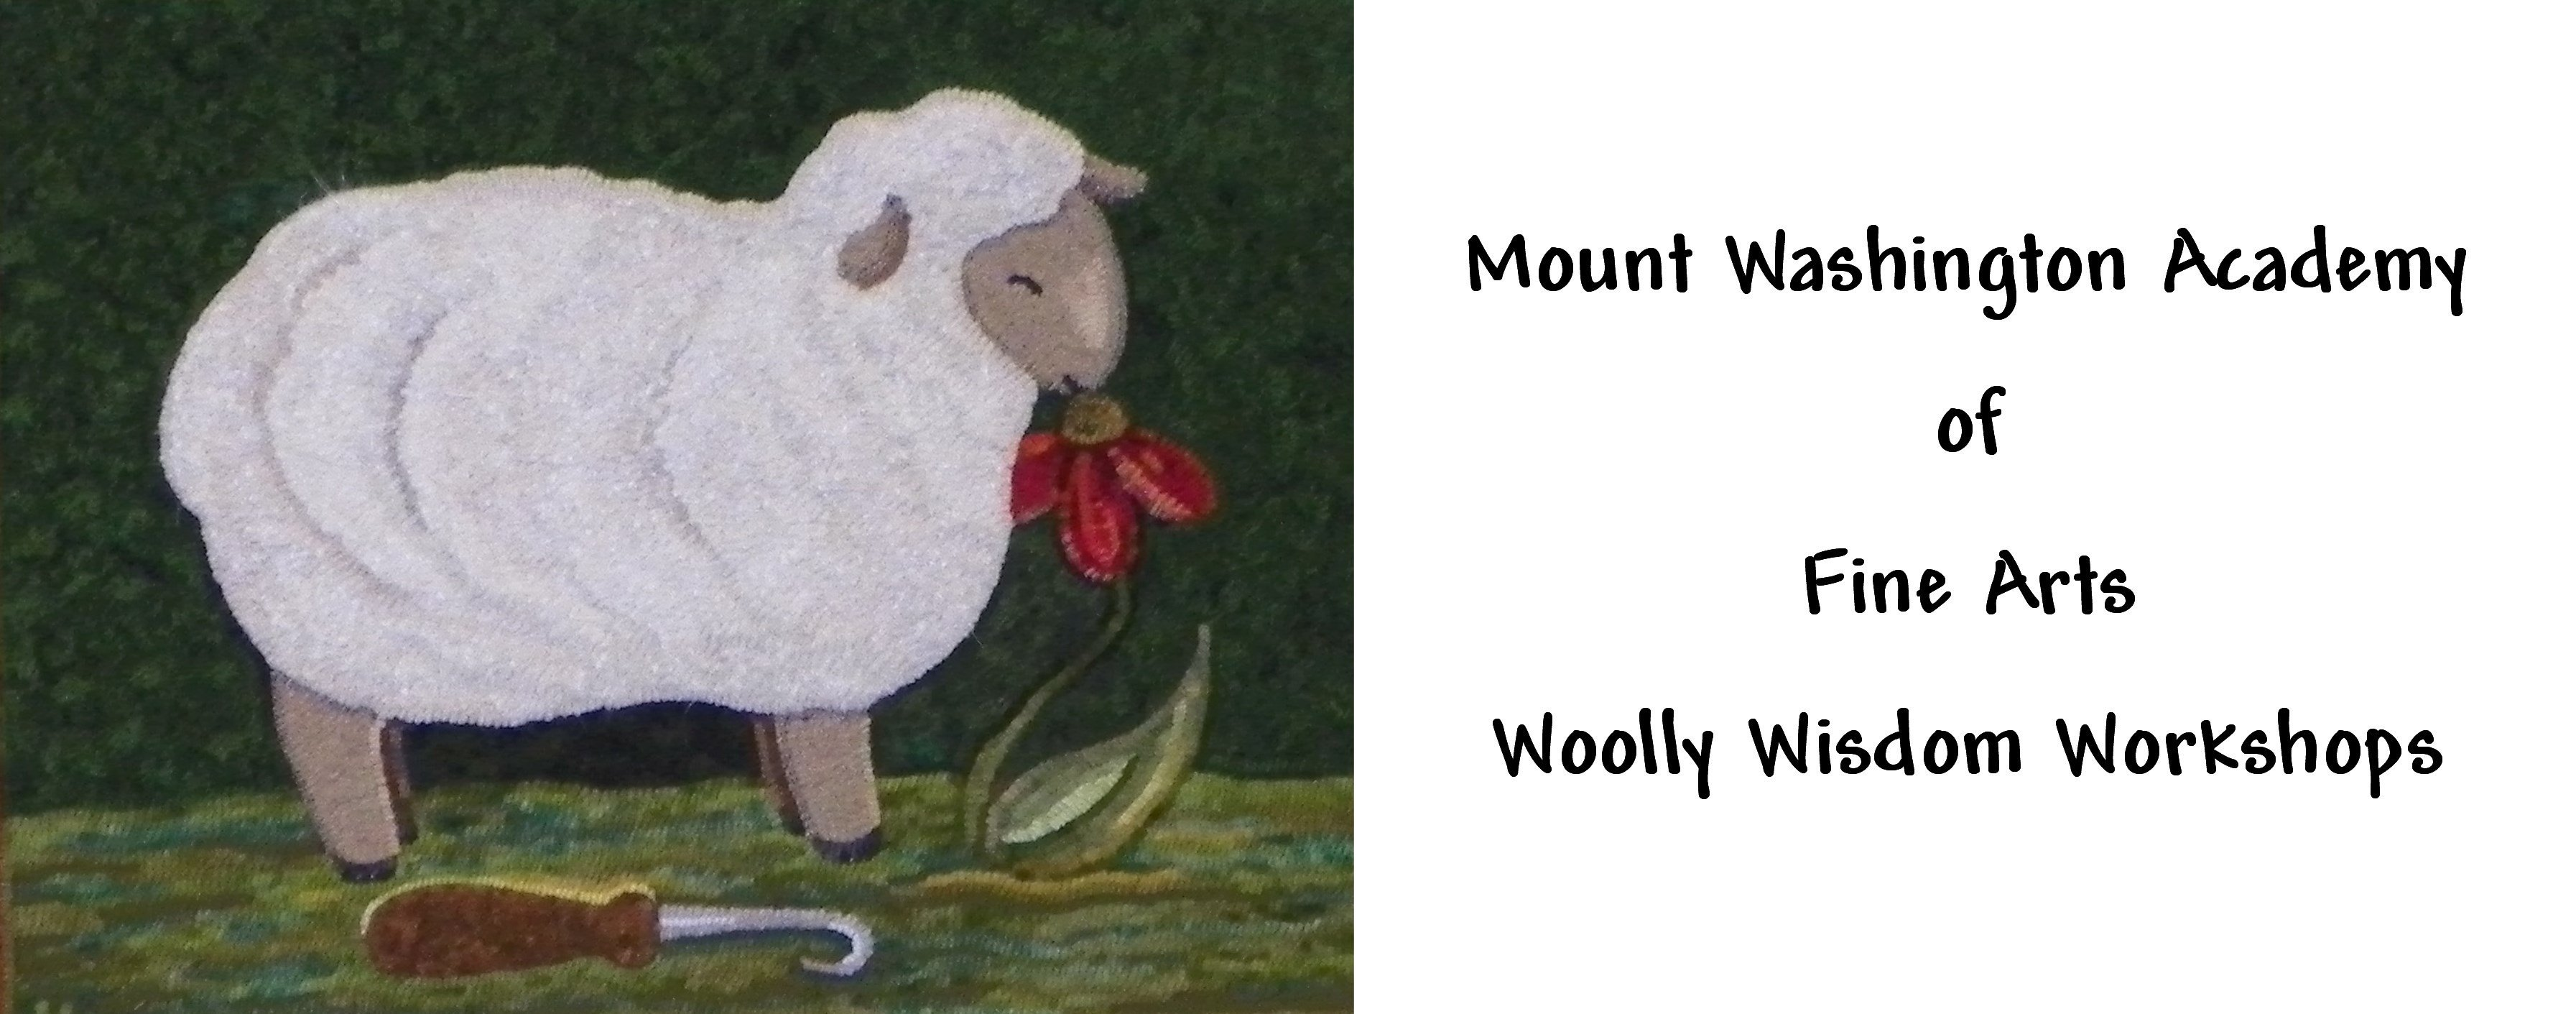 The Mt  Washington Academy of Fine Arts  Woolly Wisdom Workshop